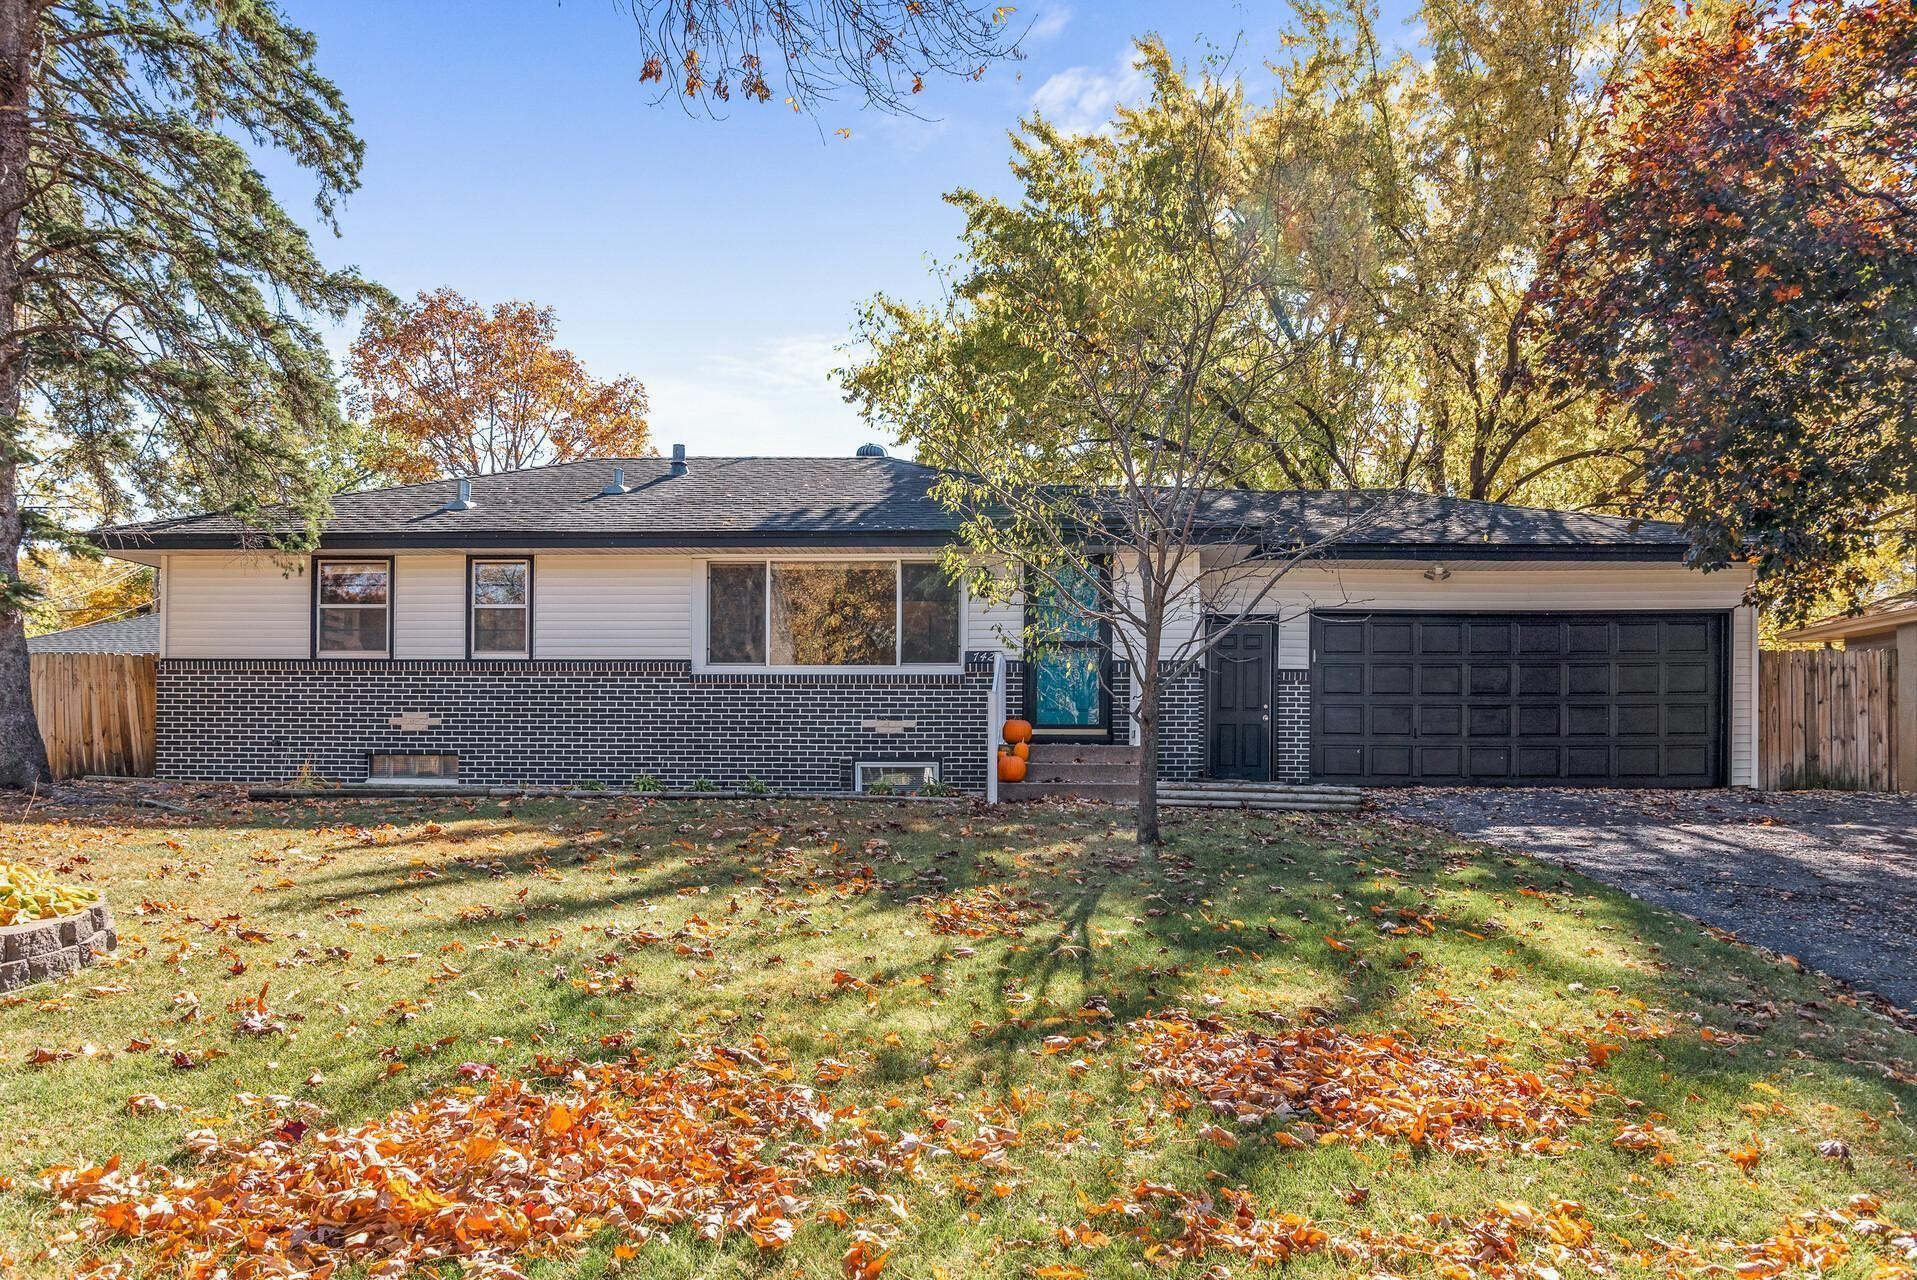 742 Lund Avenue NE, Spring Lake Park, MN 55432 - MLS#: 5669990